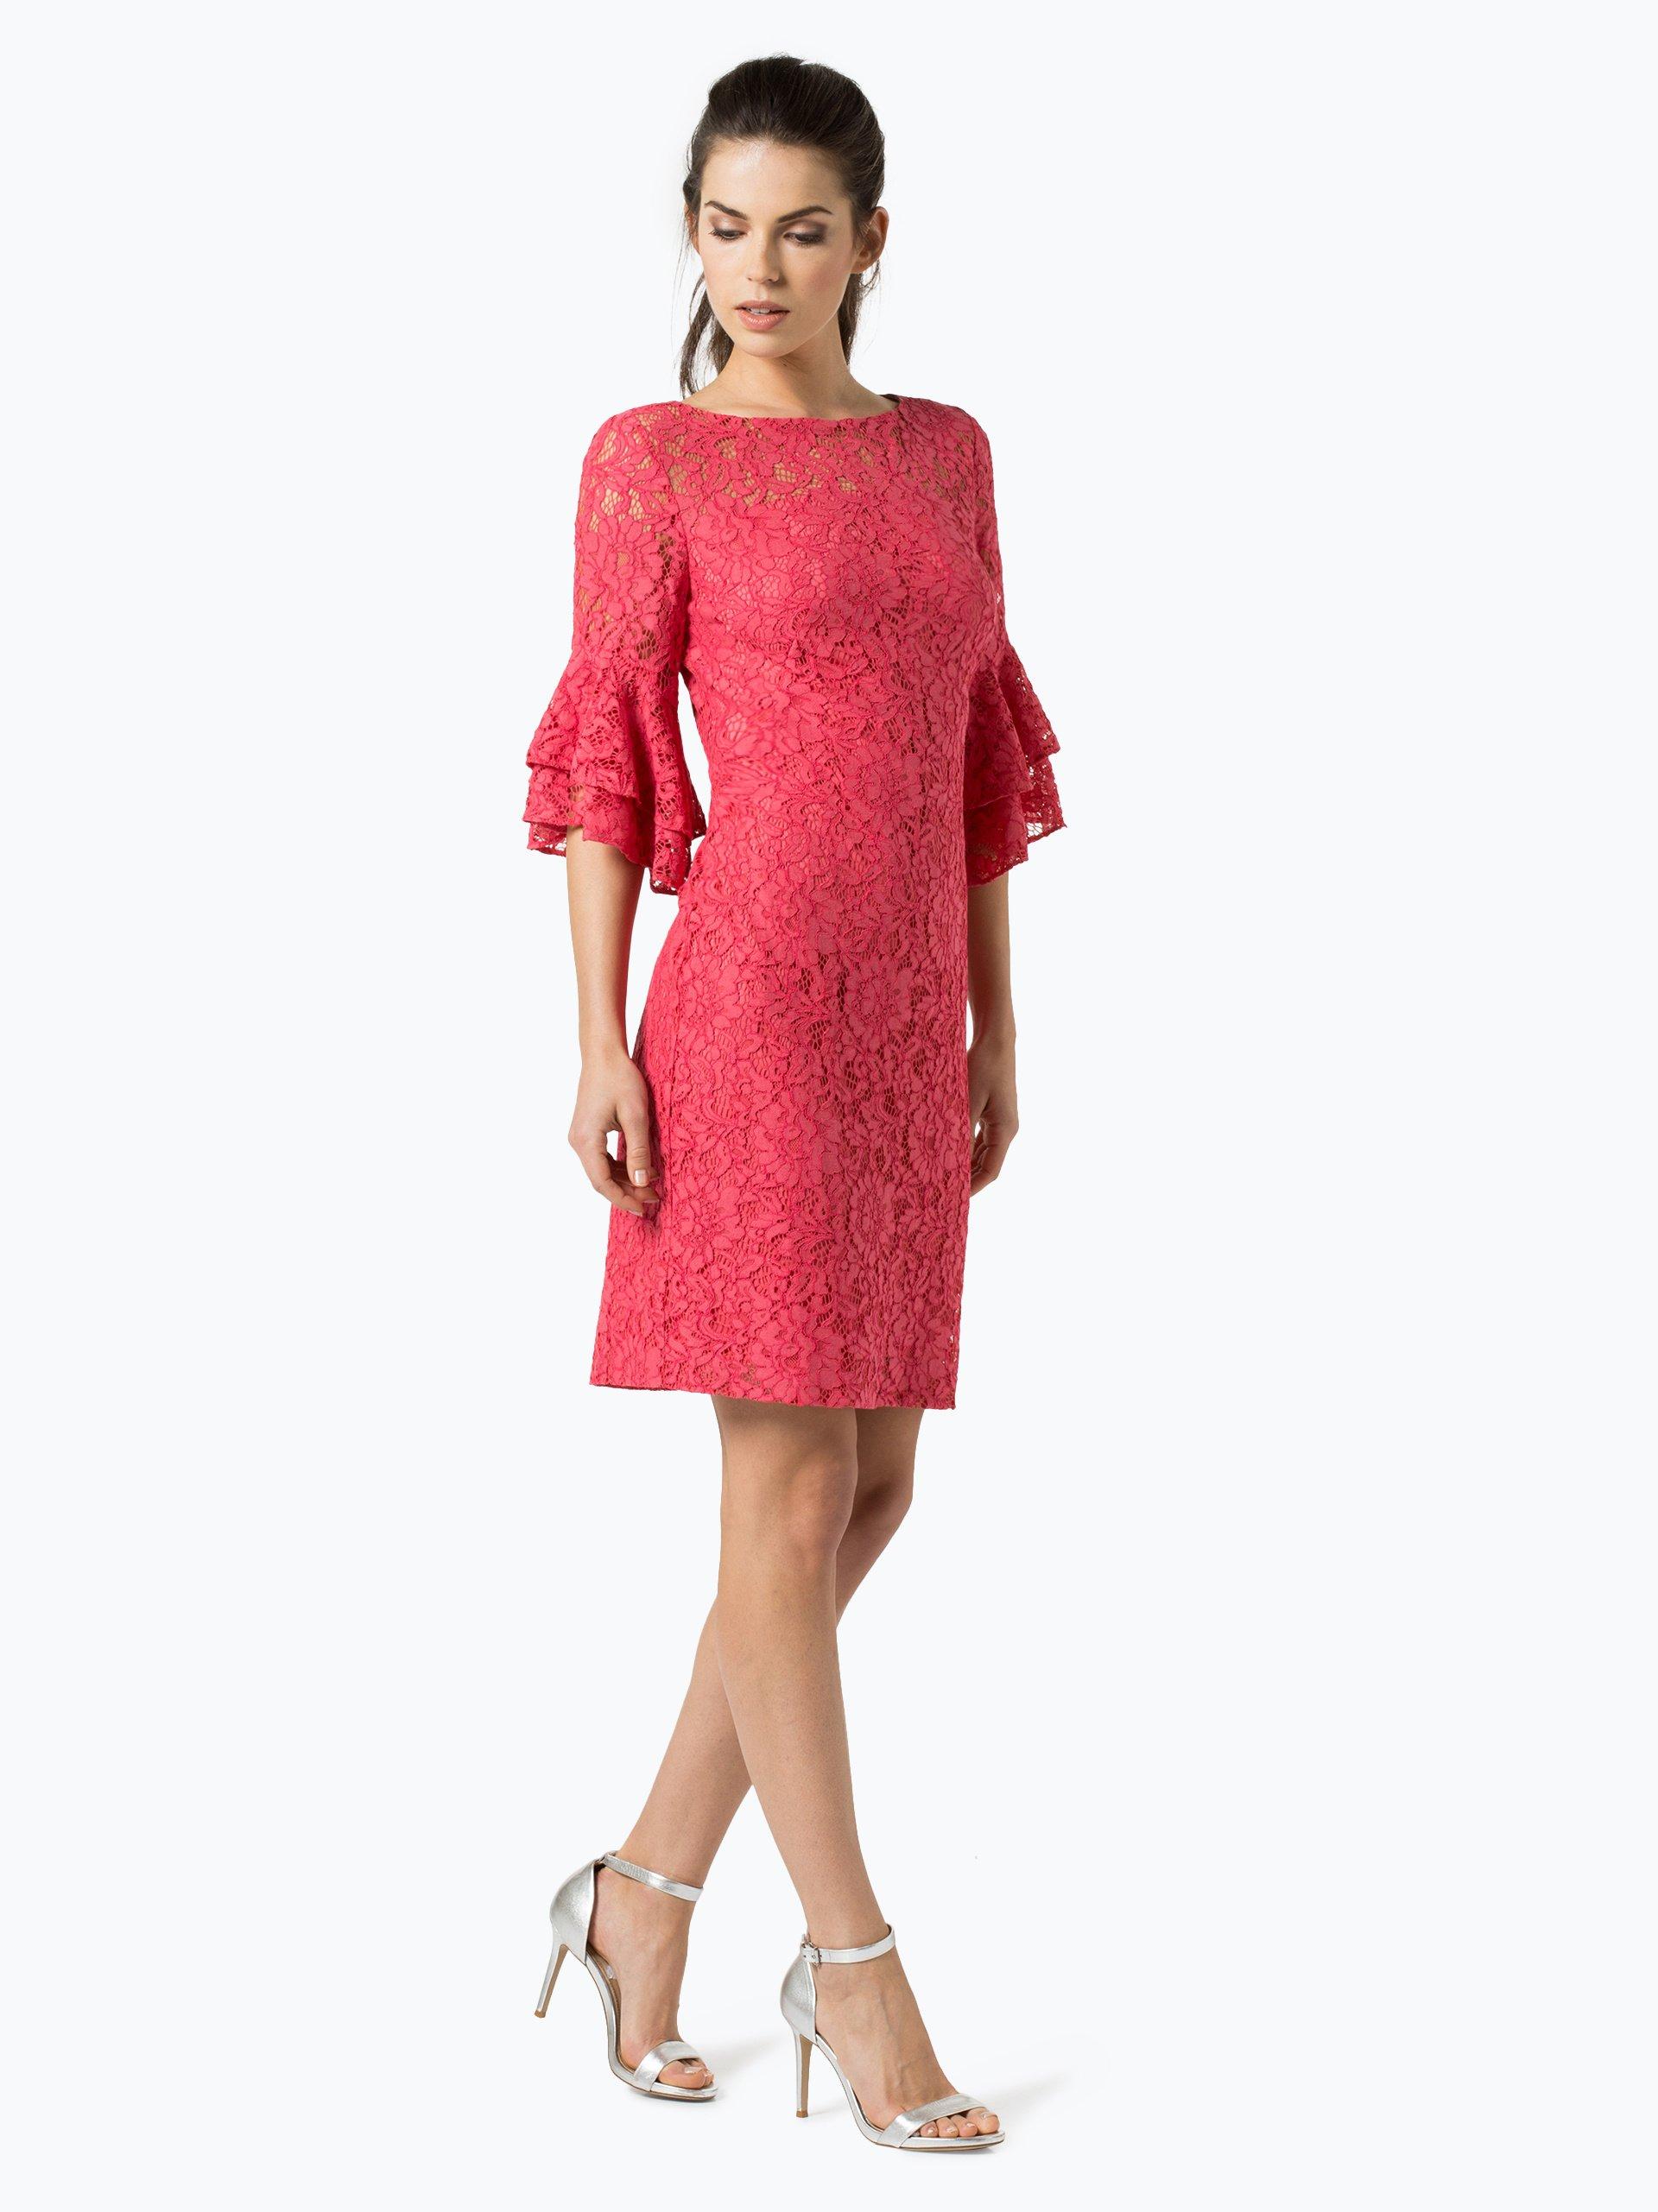 lauren ralph lauren damen kleid marcelle pink uni online kaufen peek und cloppenburg de. Black Bedroom Furniture Sets. Home Design Ideas